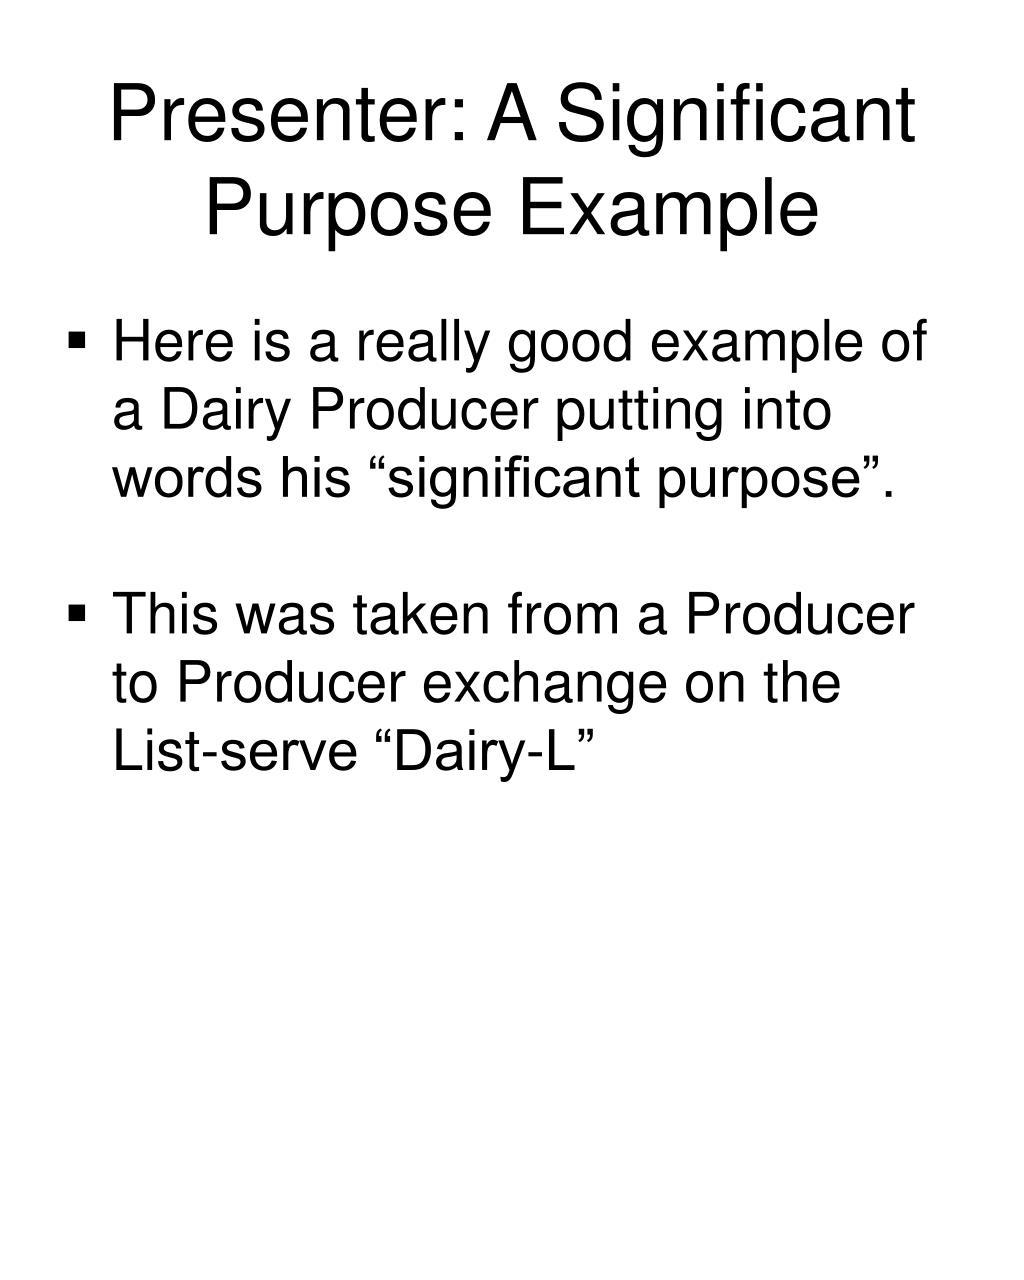 Presenter: A Significant Purpose Example